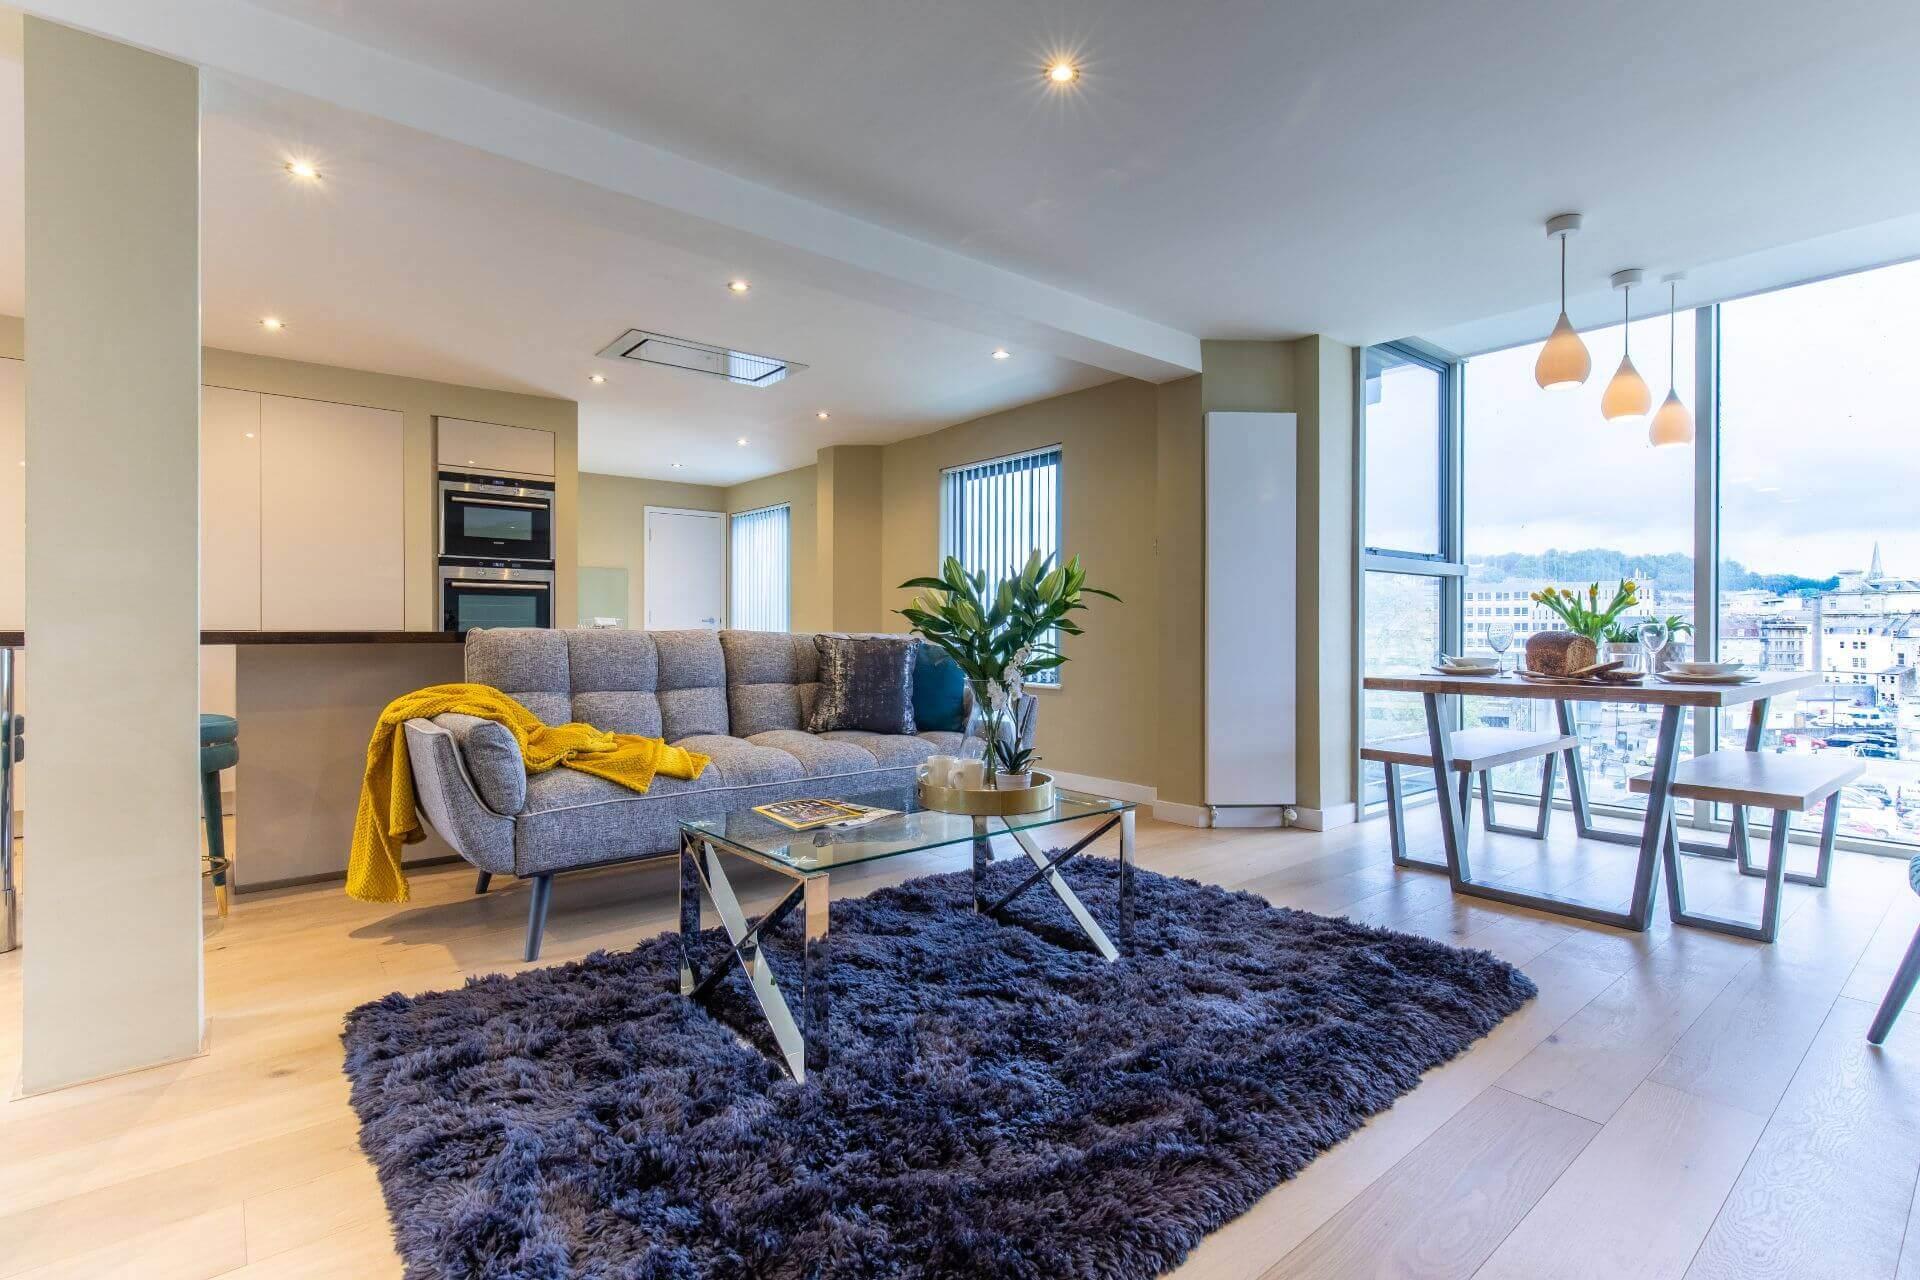 Airbnb Management in Kensington